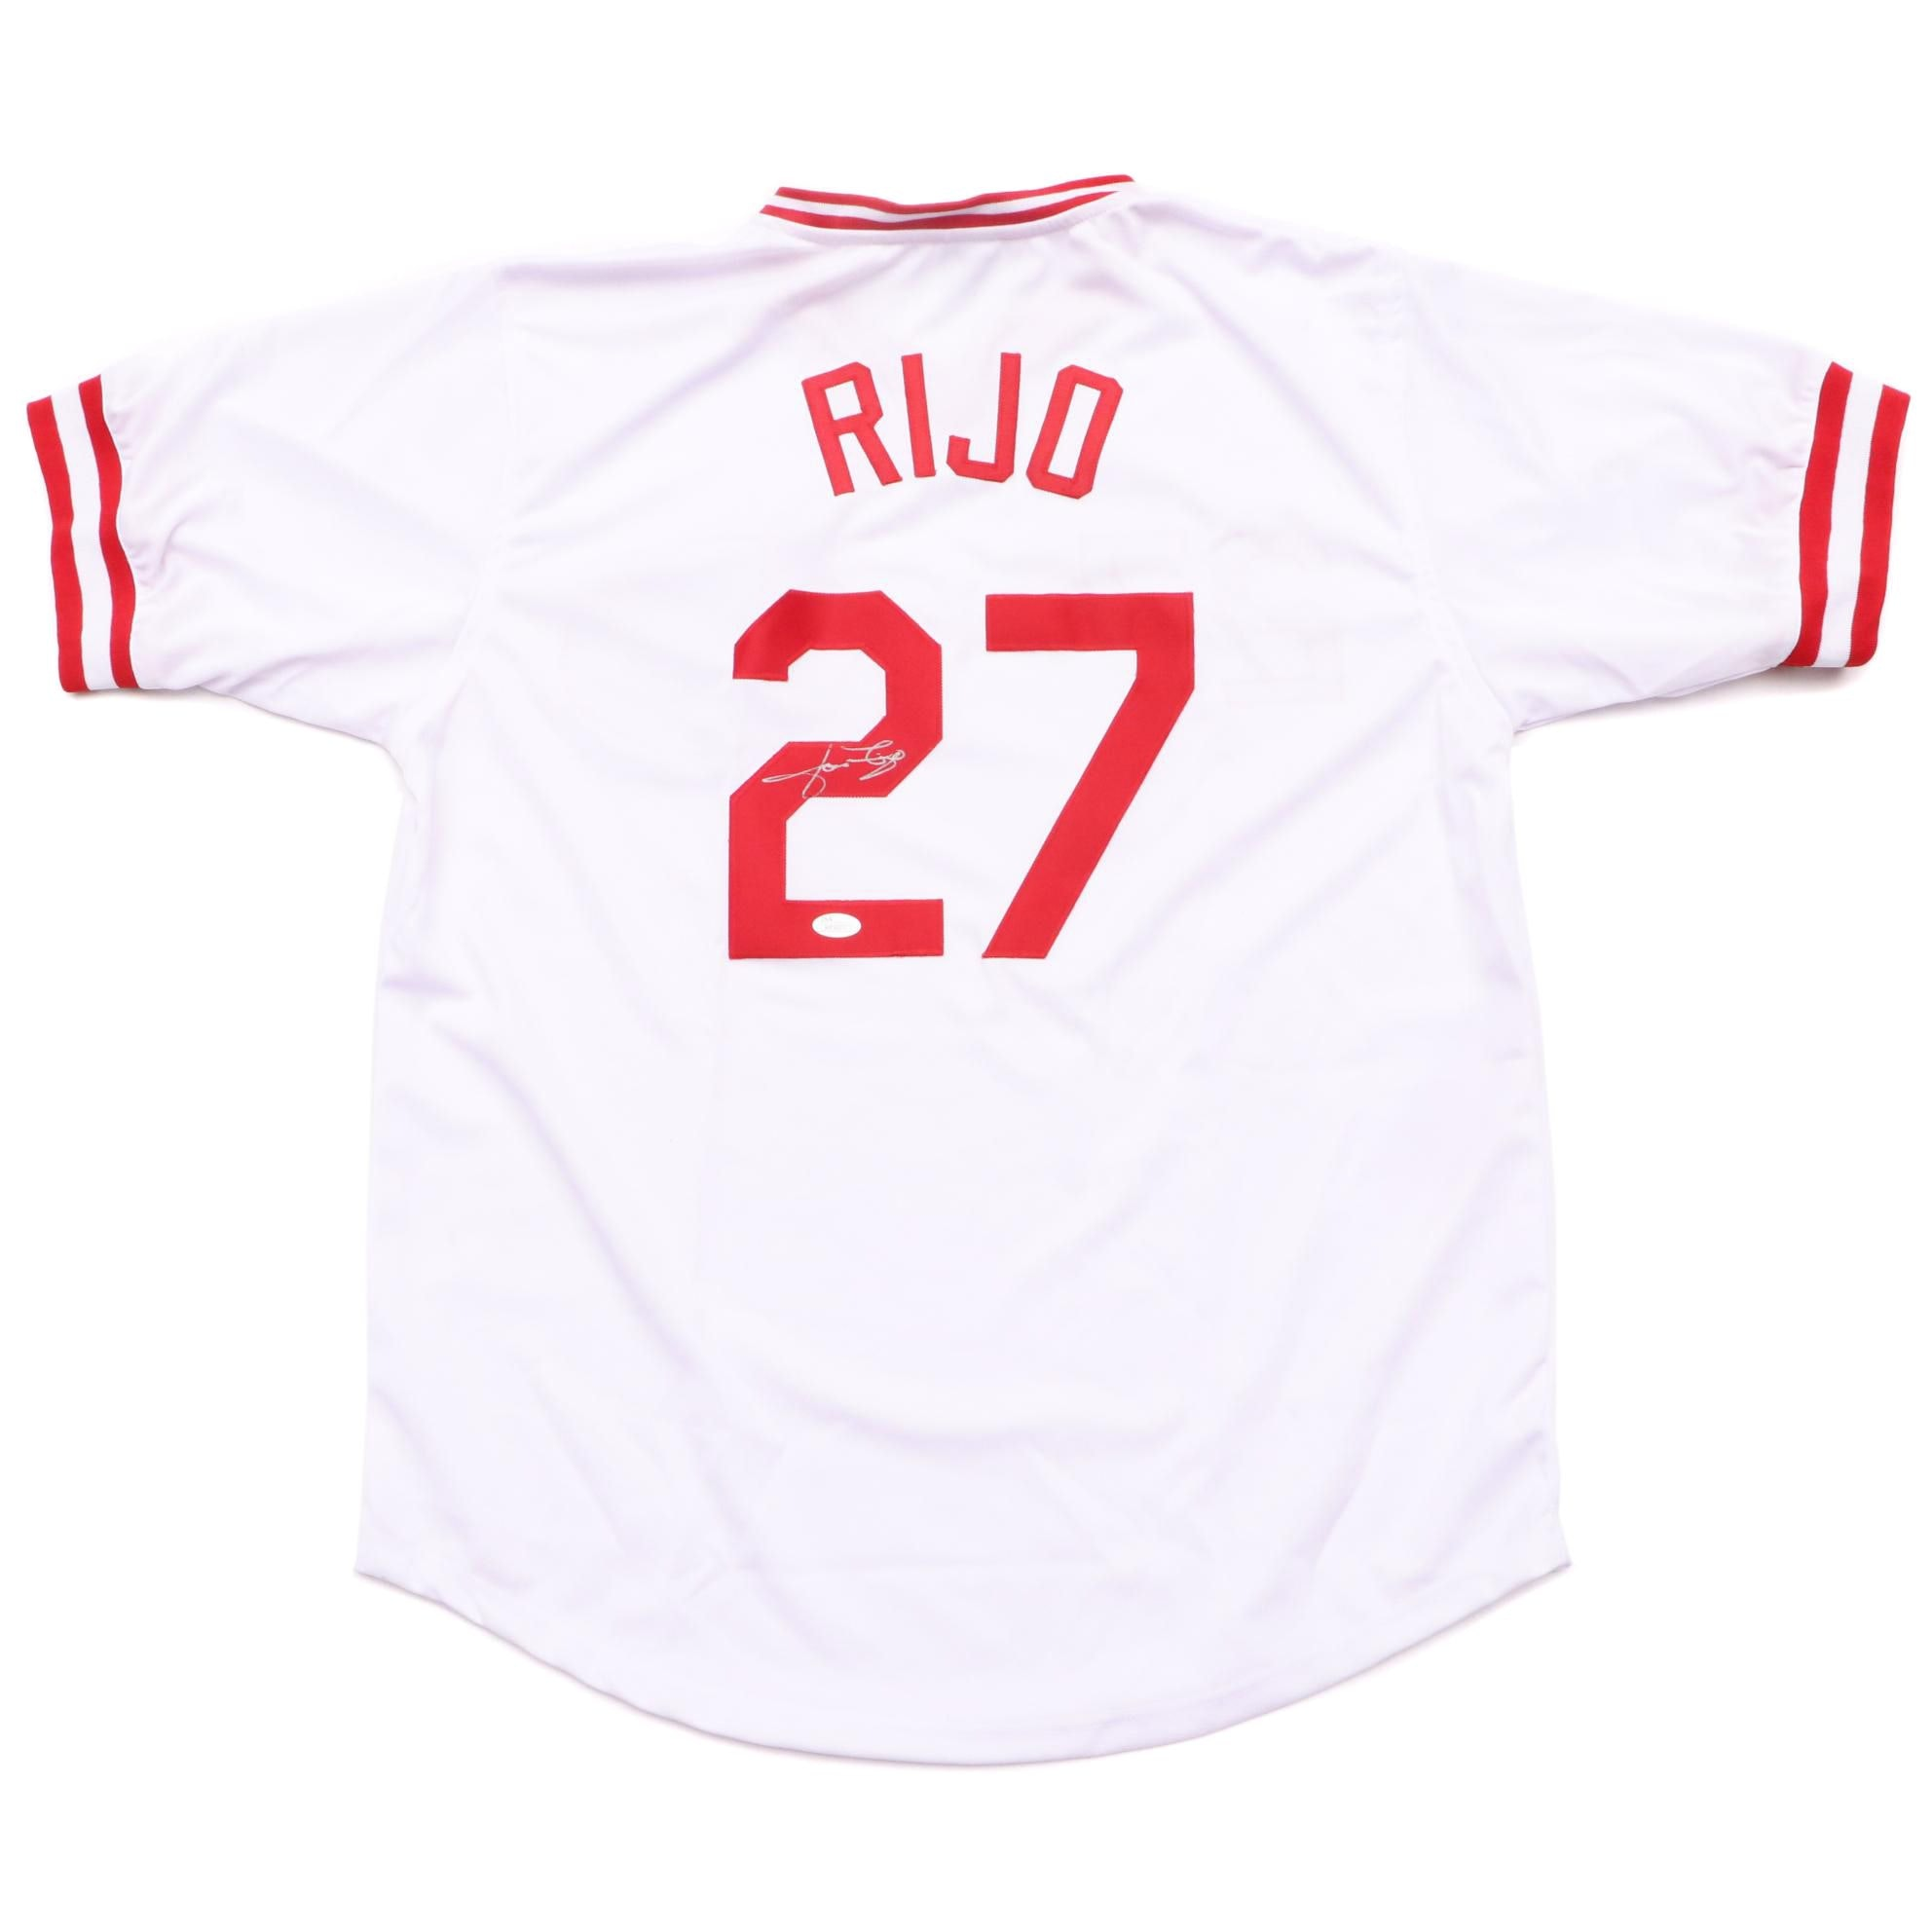 Jose Rijo Signed Reds Jersey  COA